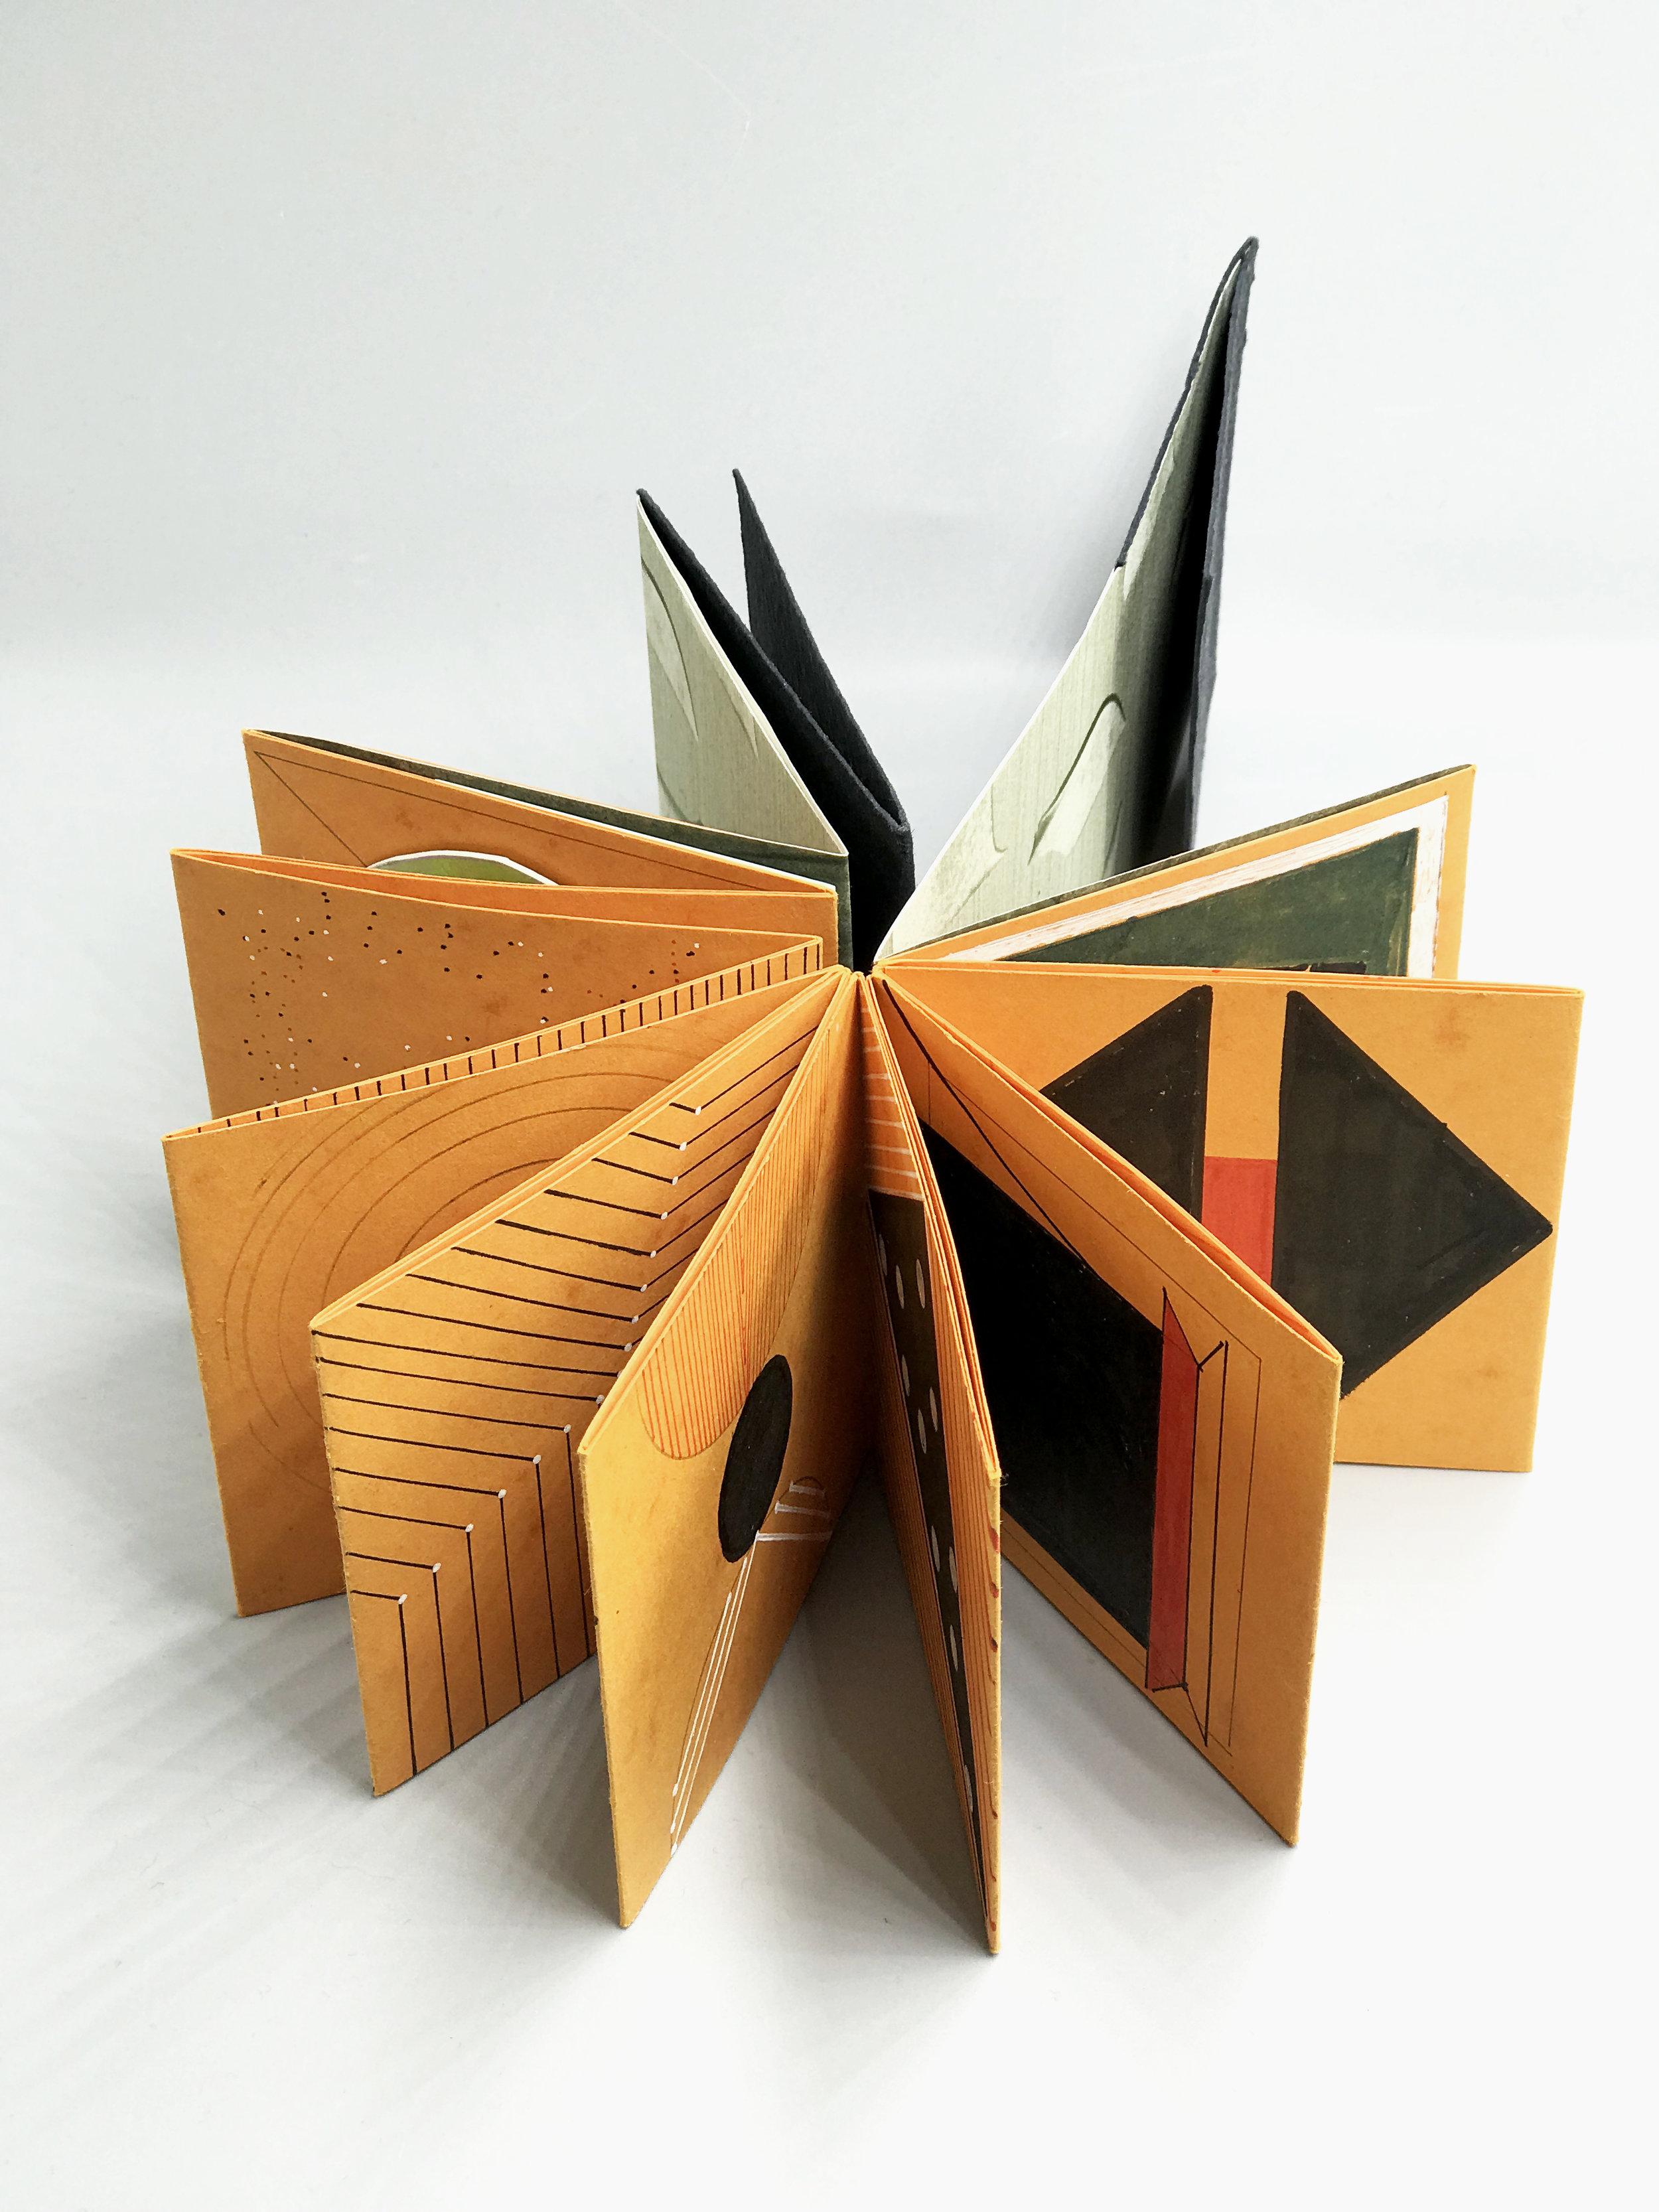 GEOMETRY BOOK I, Chang Liu, 152 X 75 mm, Artist's Book, 2018